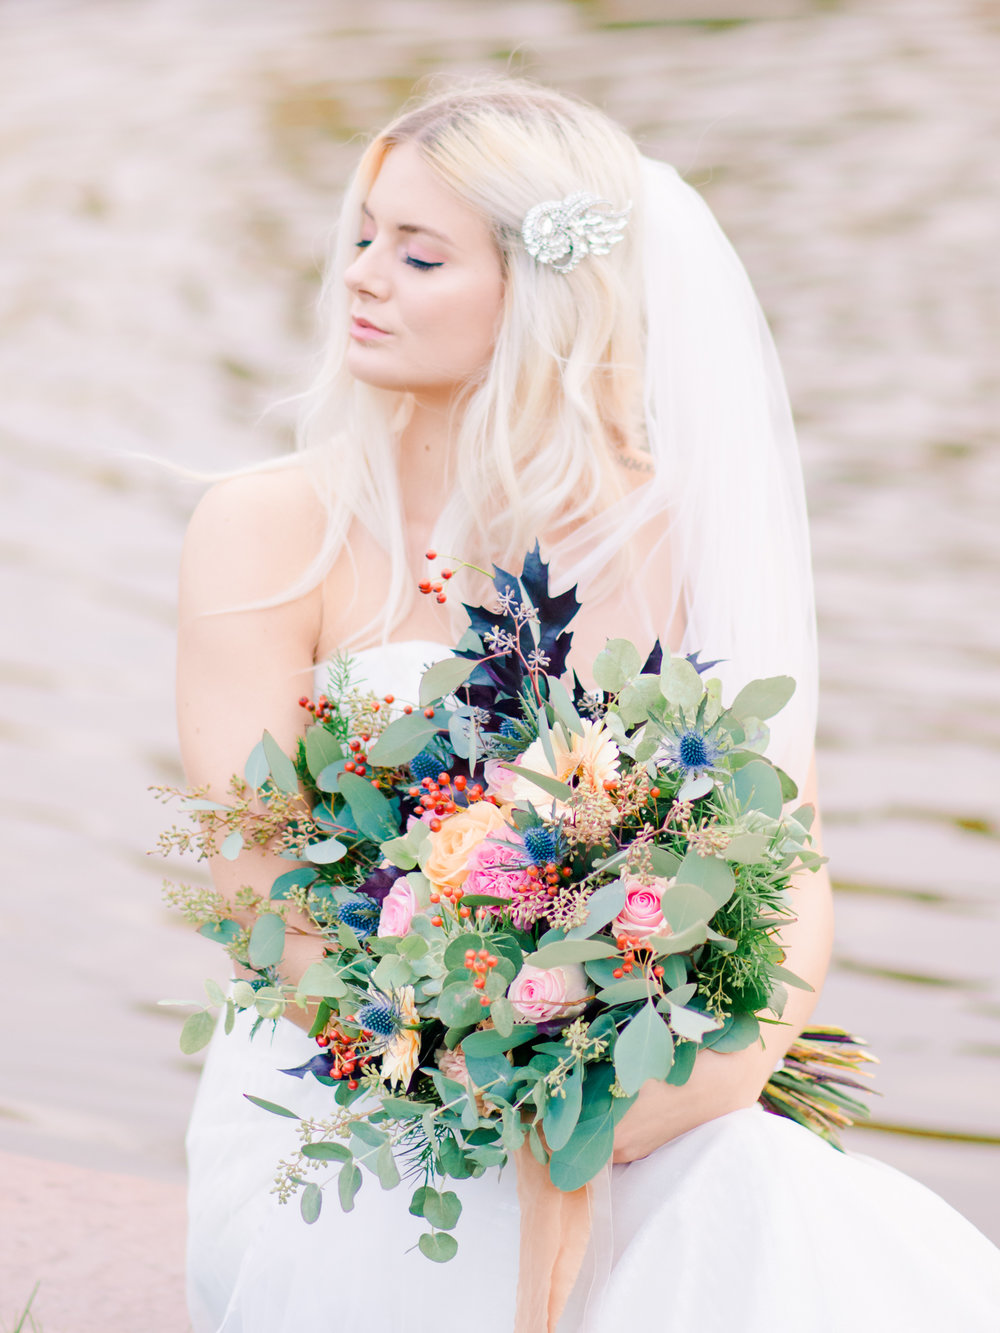 Elegant Organic Fall Swedish Bridal Wedding Styled Shoot - Erika Alvarenga Photography-33.jpg